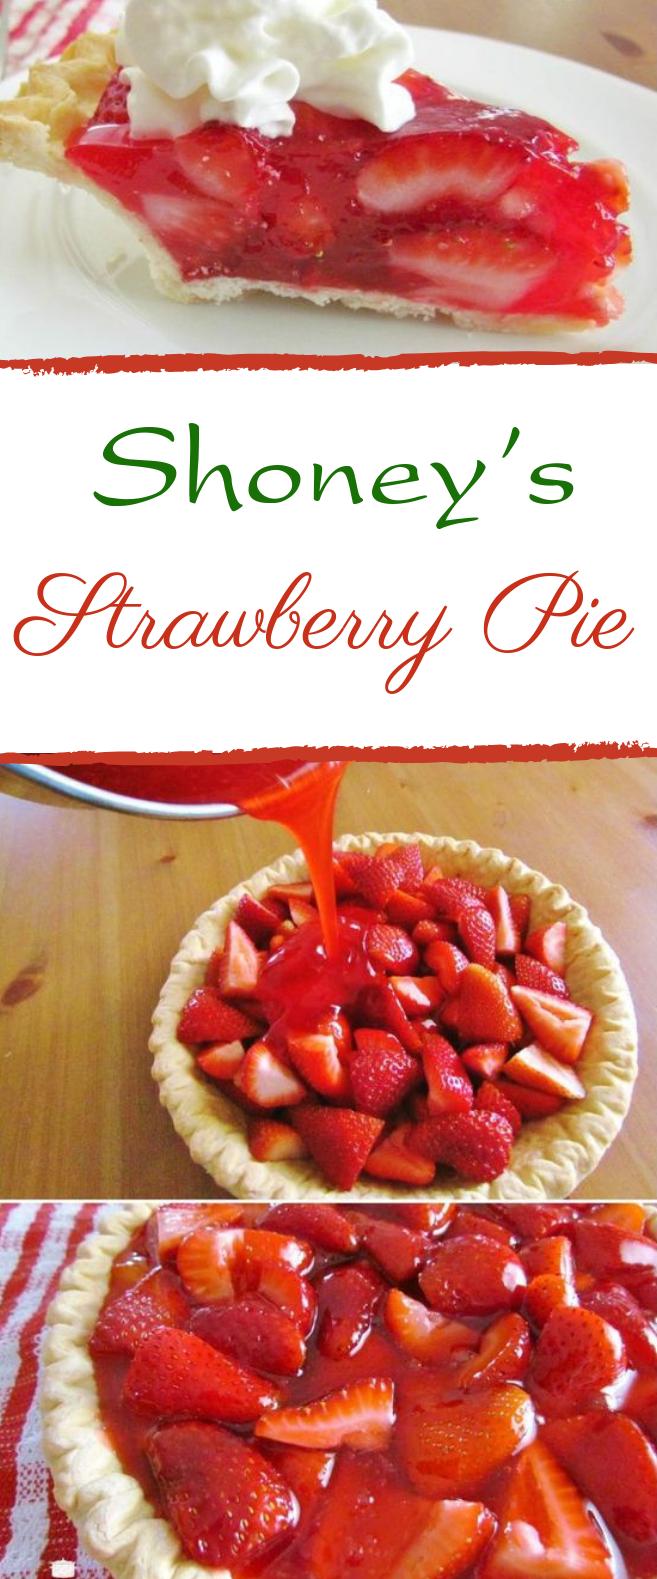 Shoney's Strawberry Pie #strawberry #desserts